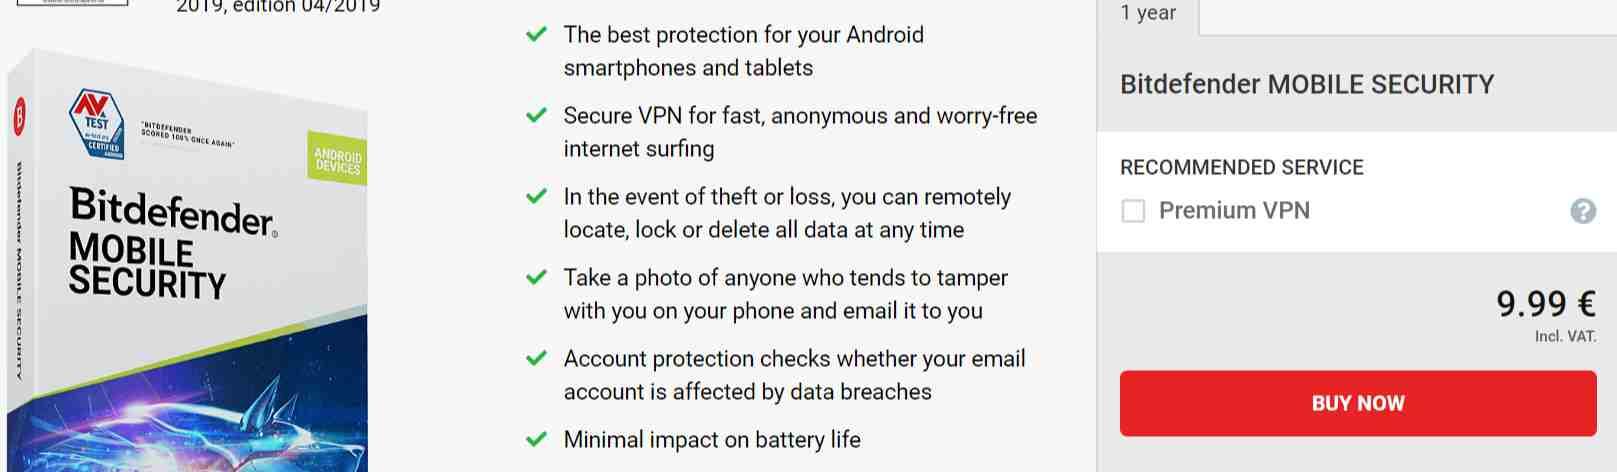 Bitdefender Mobile Security Gutscheincode